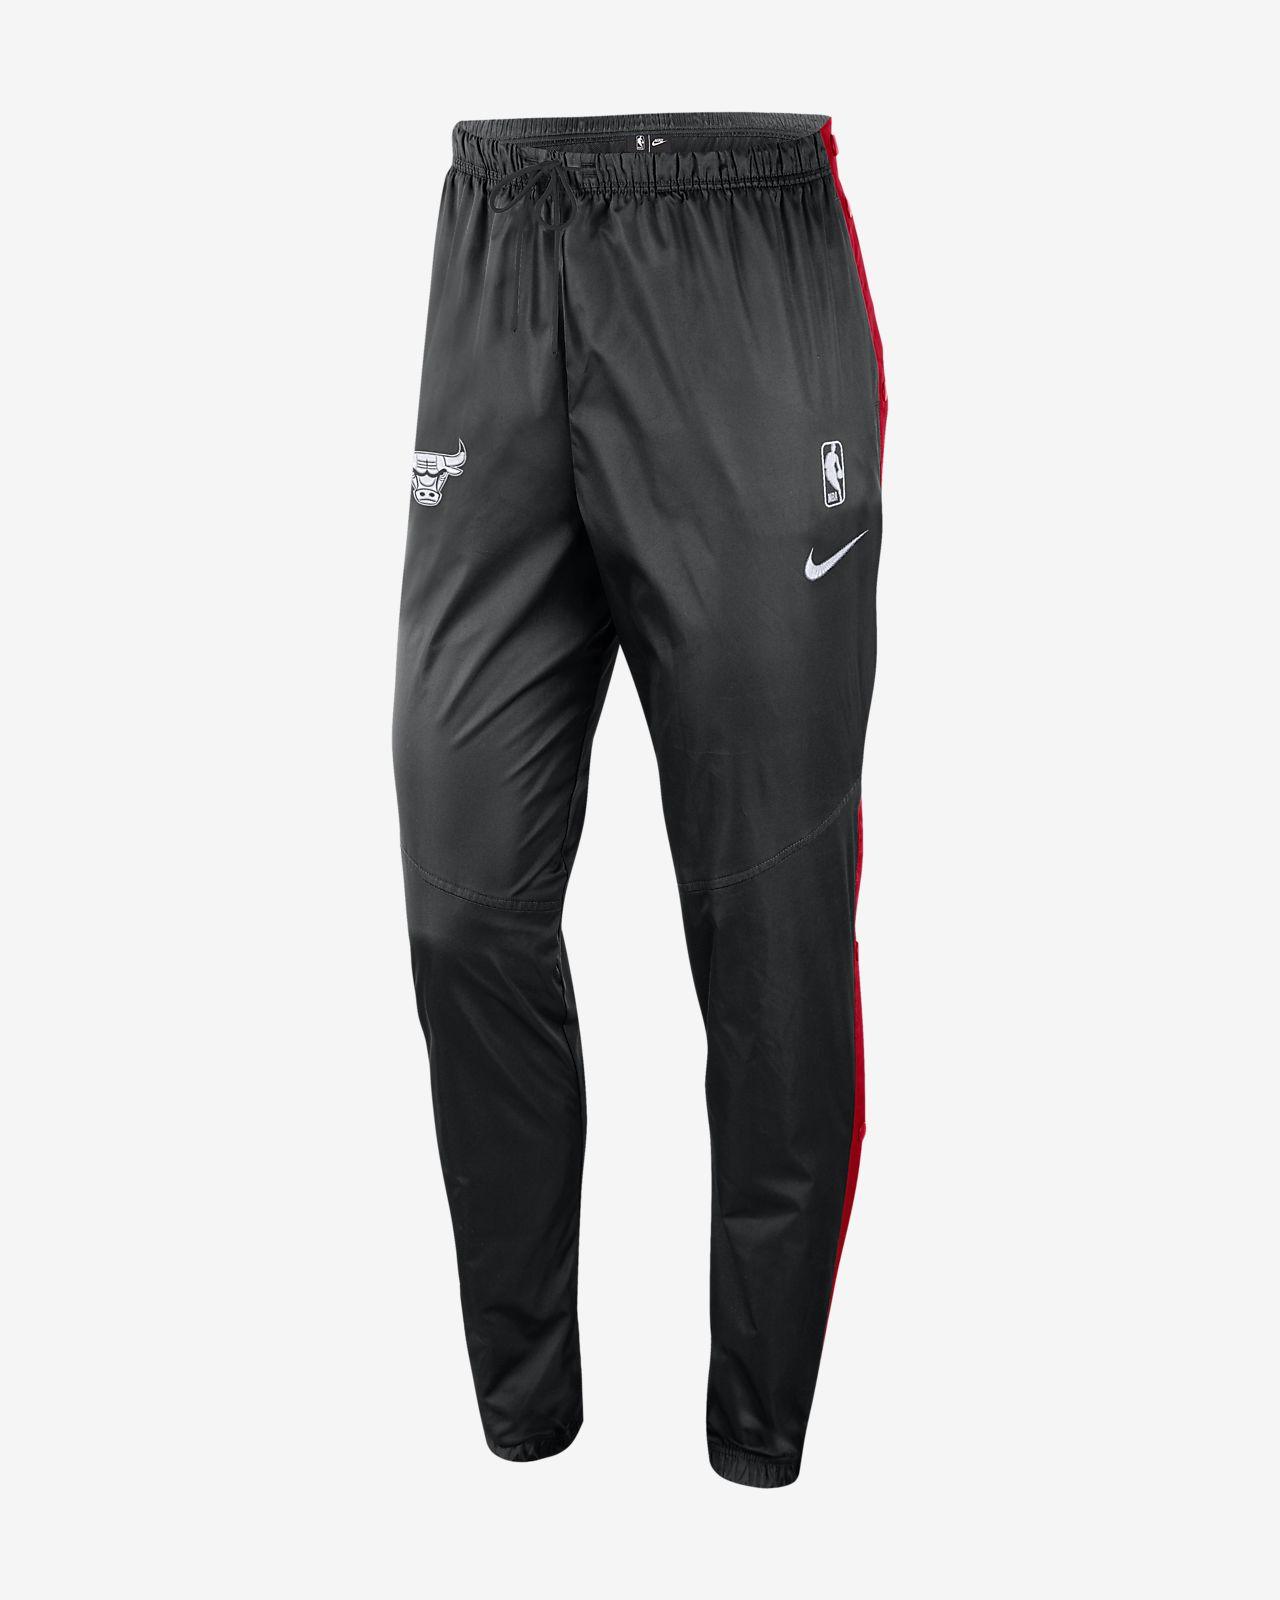 Chicago Bulls Nike Women's NBA Trousers